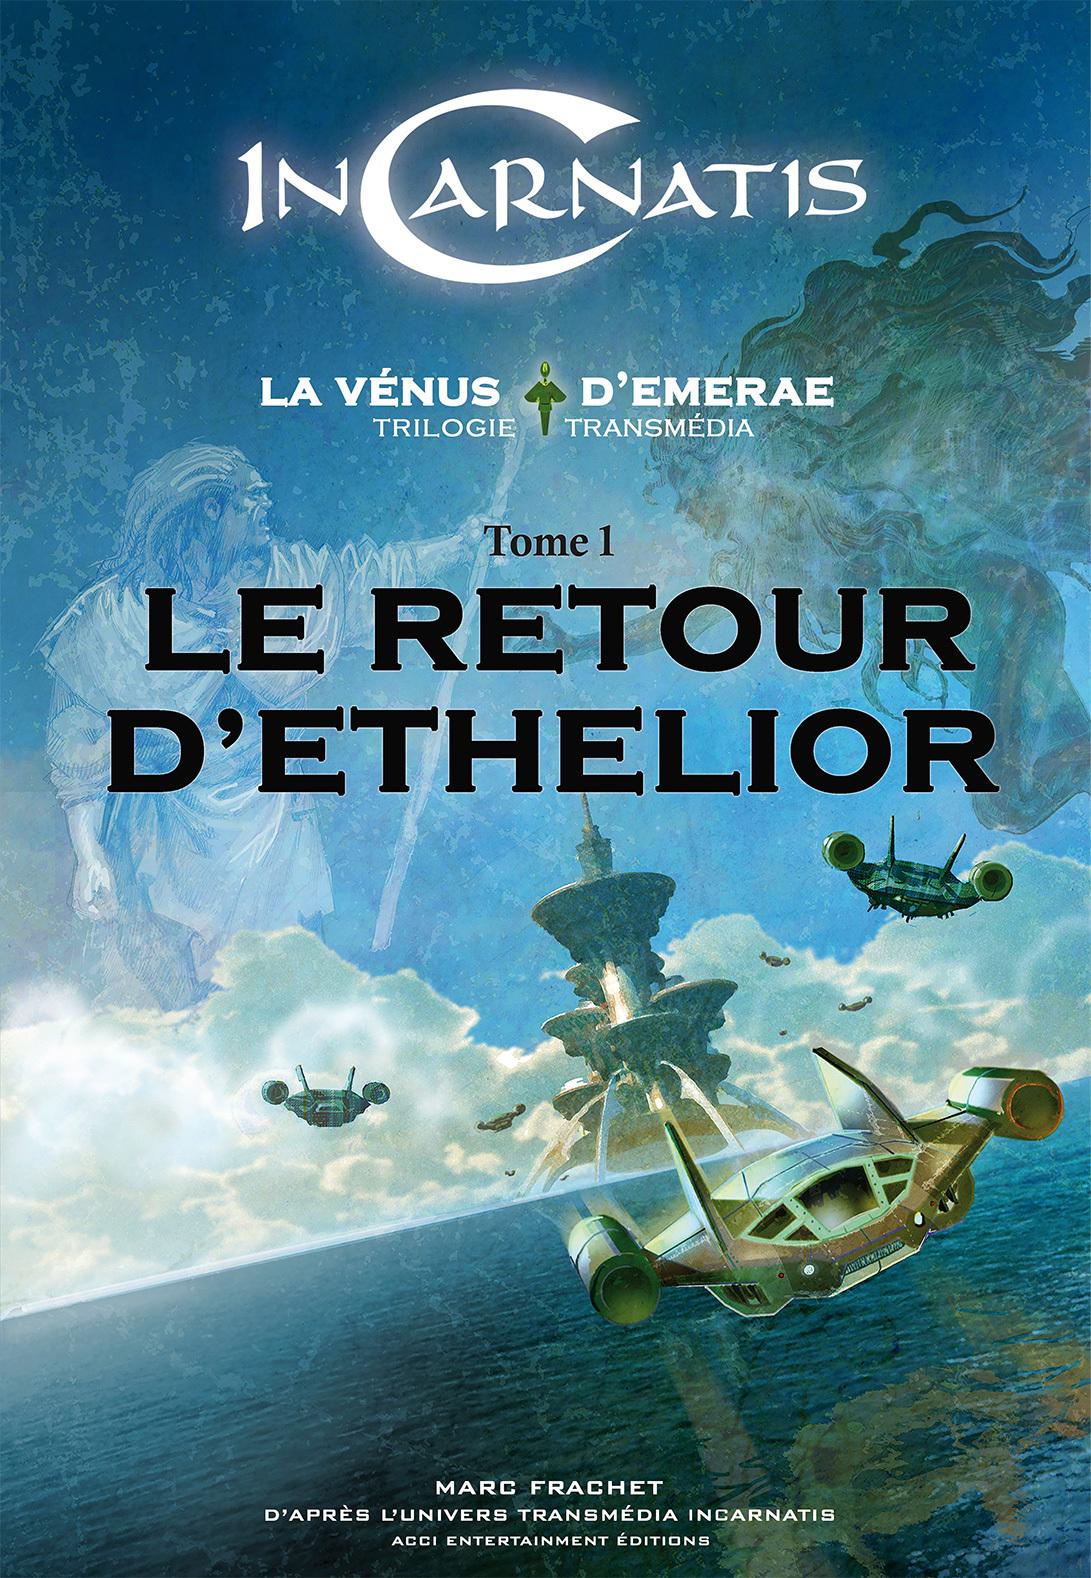 INCARNATIS, LA VENUS D'EMERAE, LE RETOUR D'ETHELIOR, VOL. 1